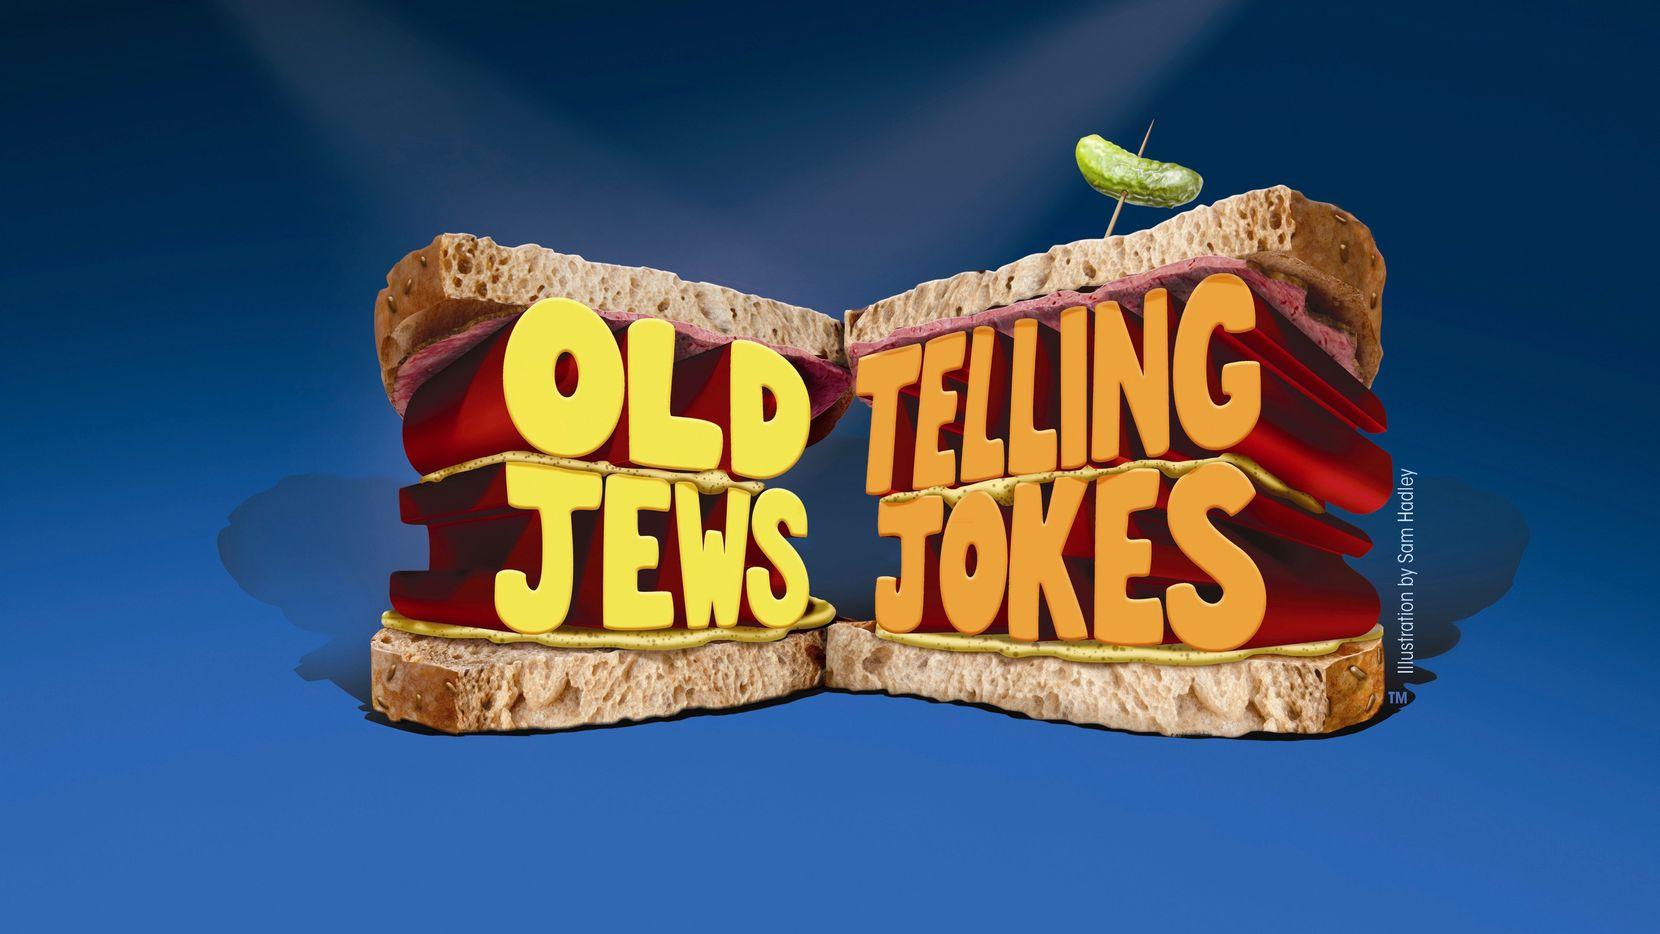 Old Jews Telling Jokes runs through July 28 at the Eisemann Center in Richardson.